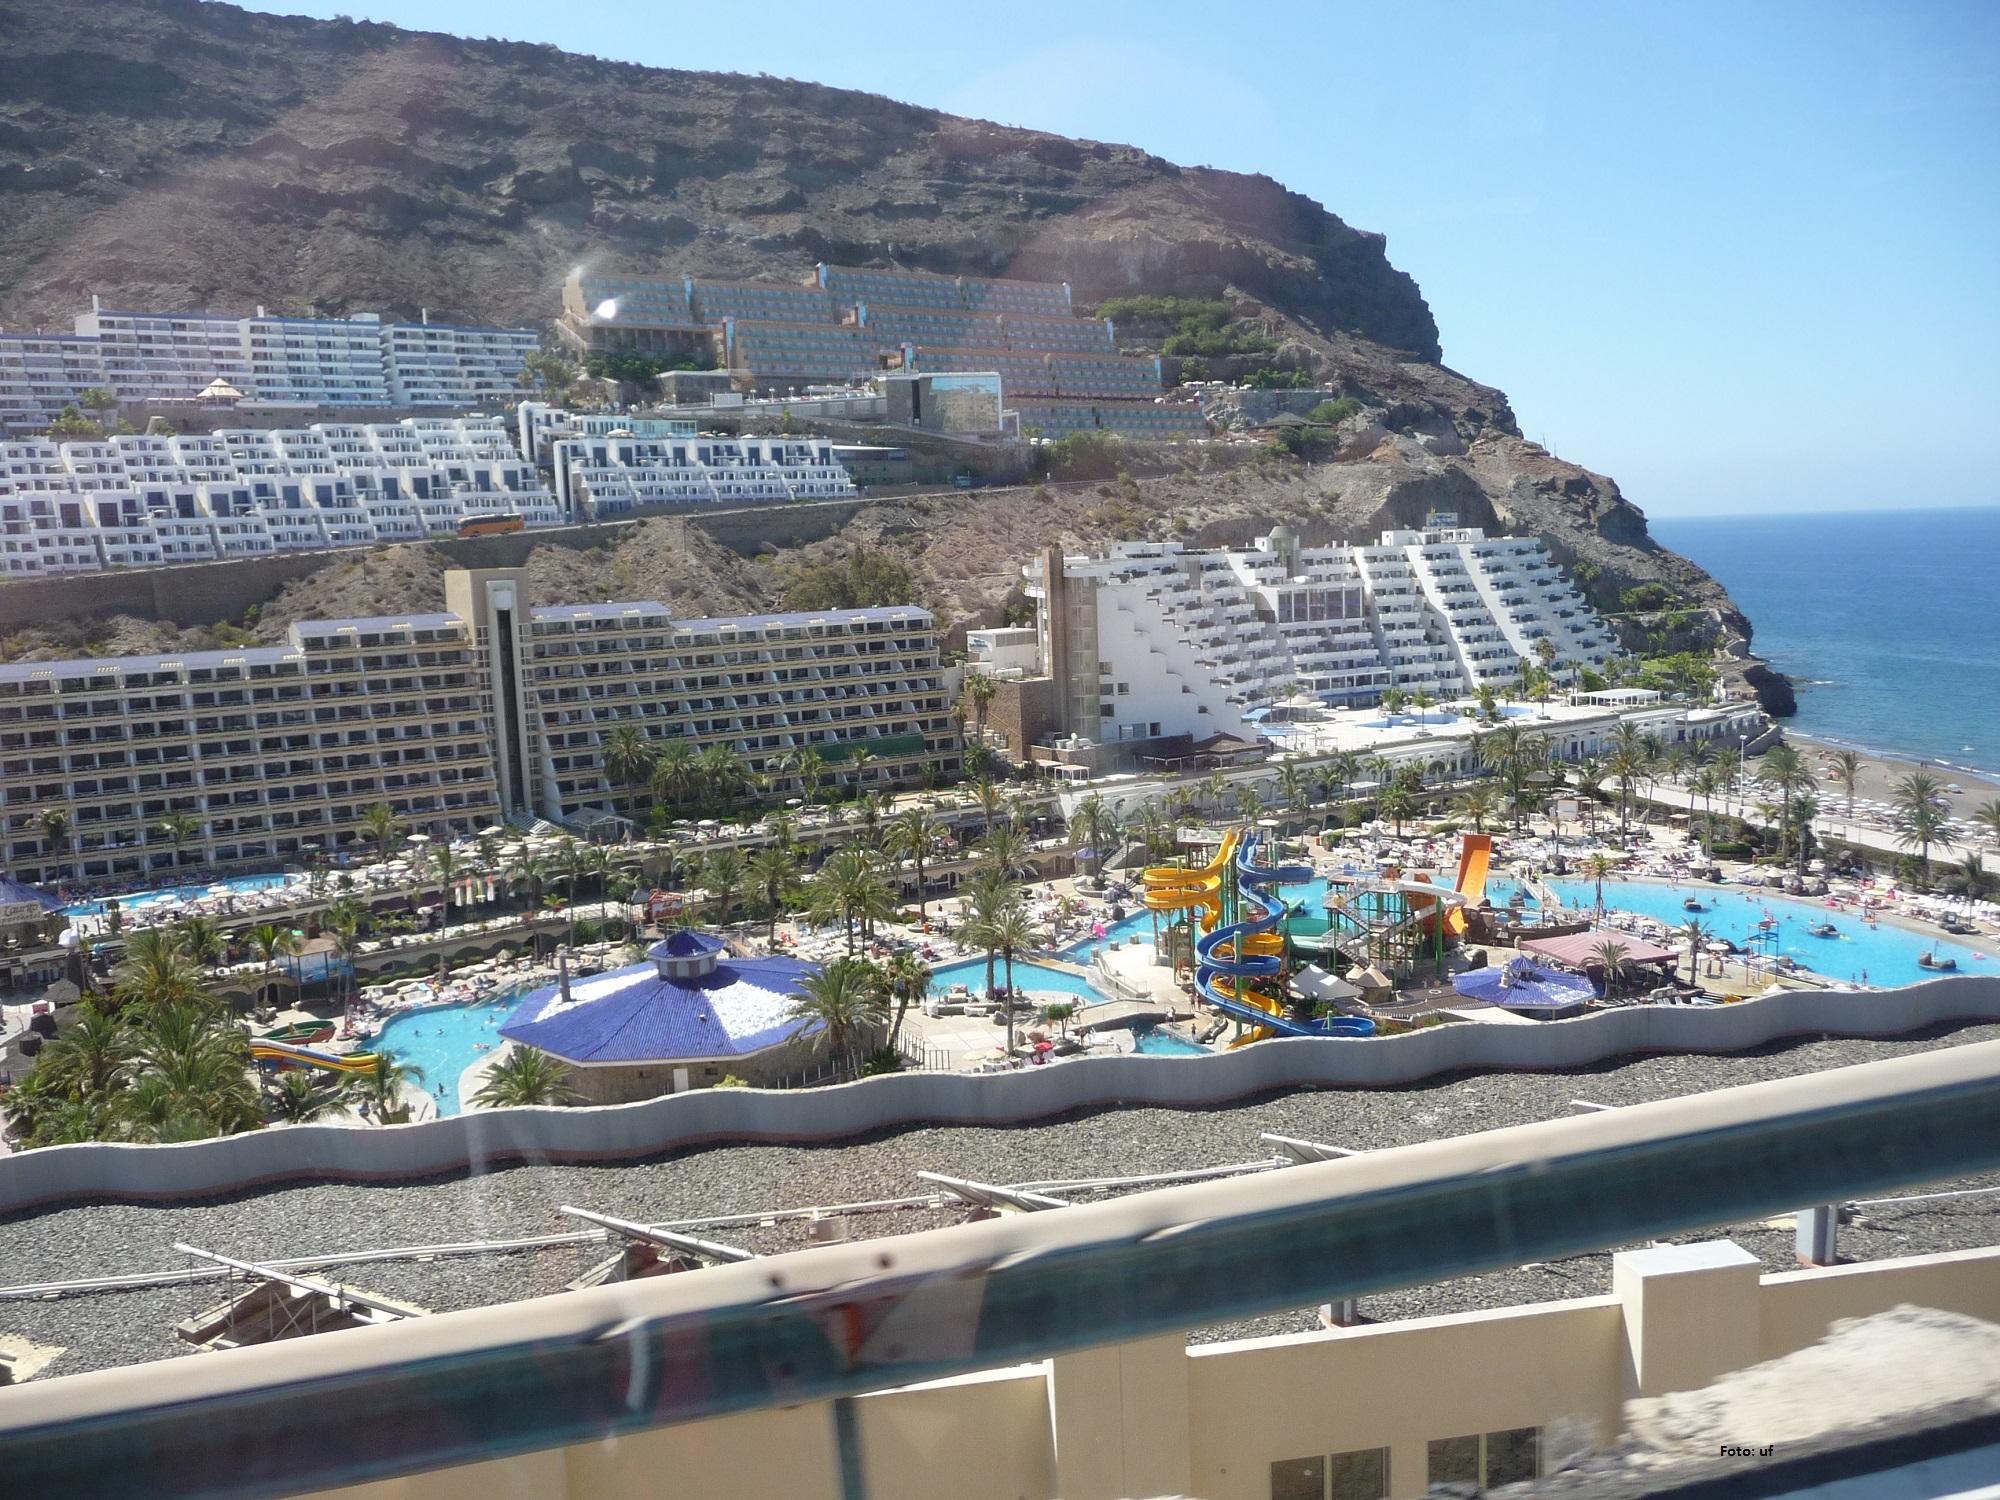 Playa Tauritio - Blick auf den Meerwasser-Aquapark im Paradise Resort